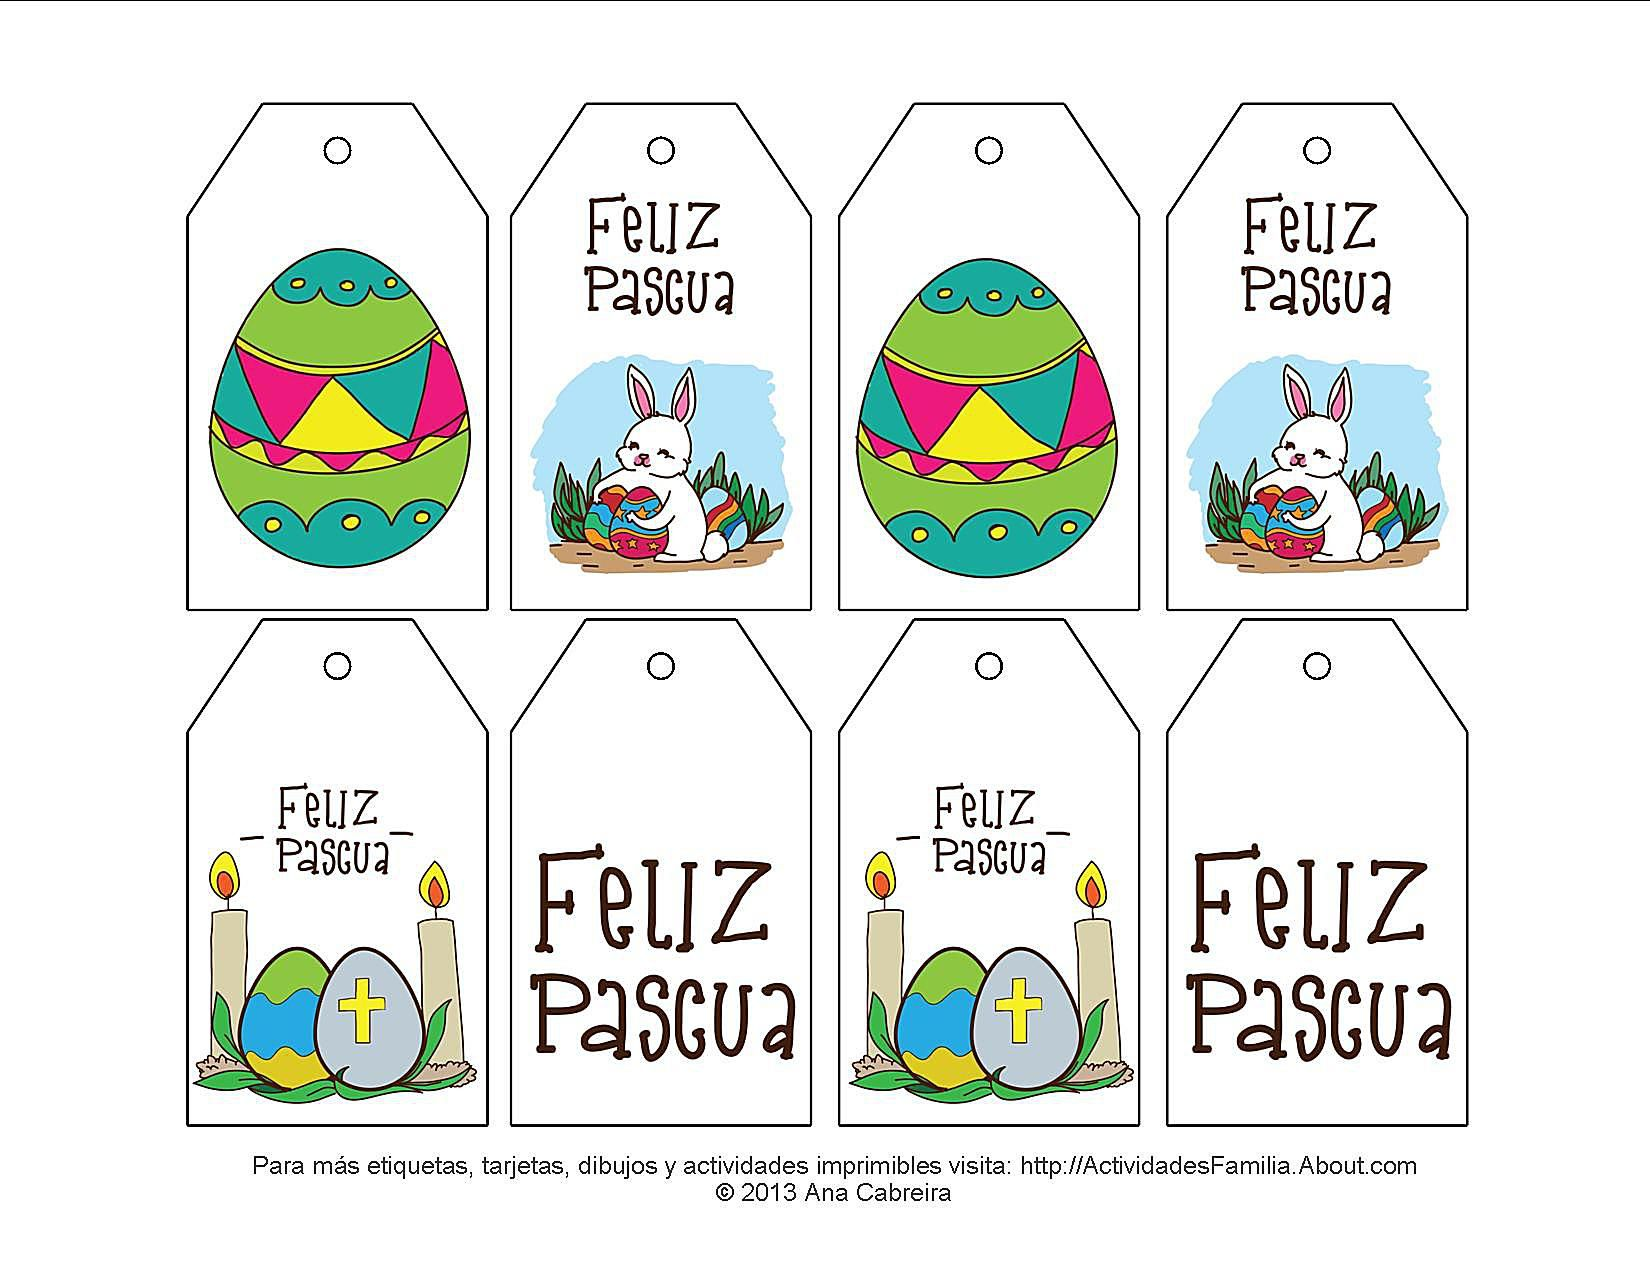 Etiquetas de Pascua para imprimir